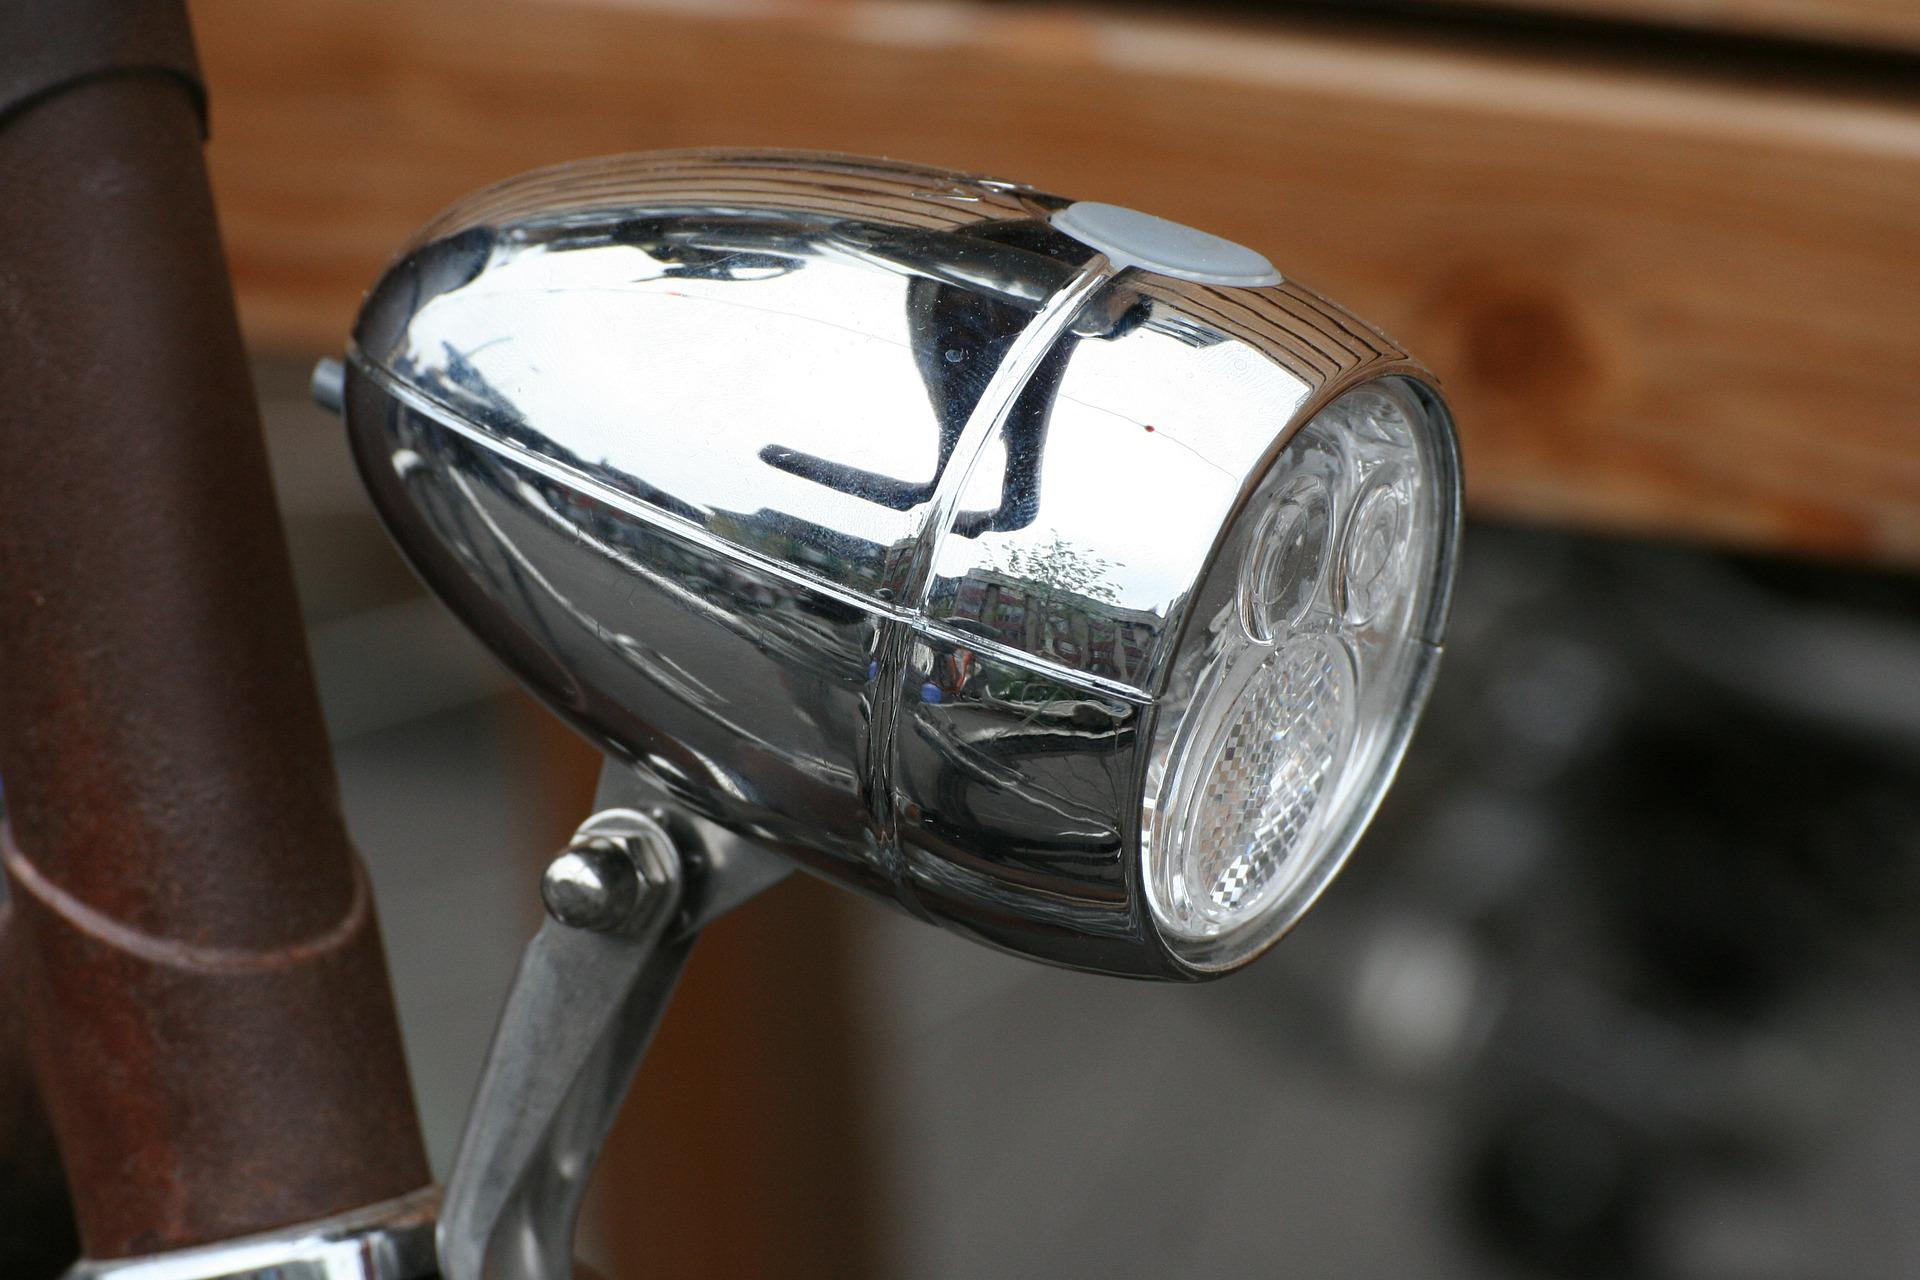 Frontlampe -Fahrradbeleuchtung im Test